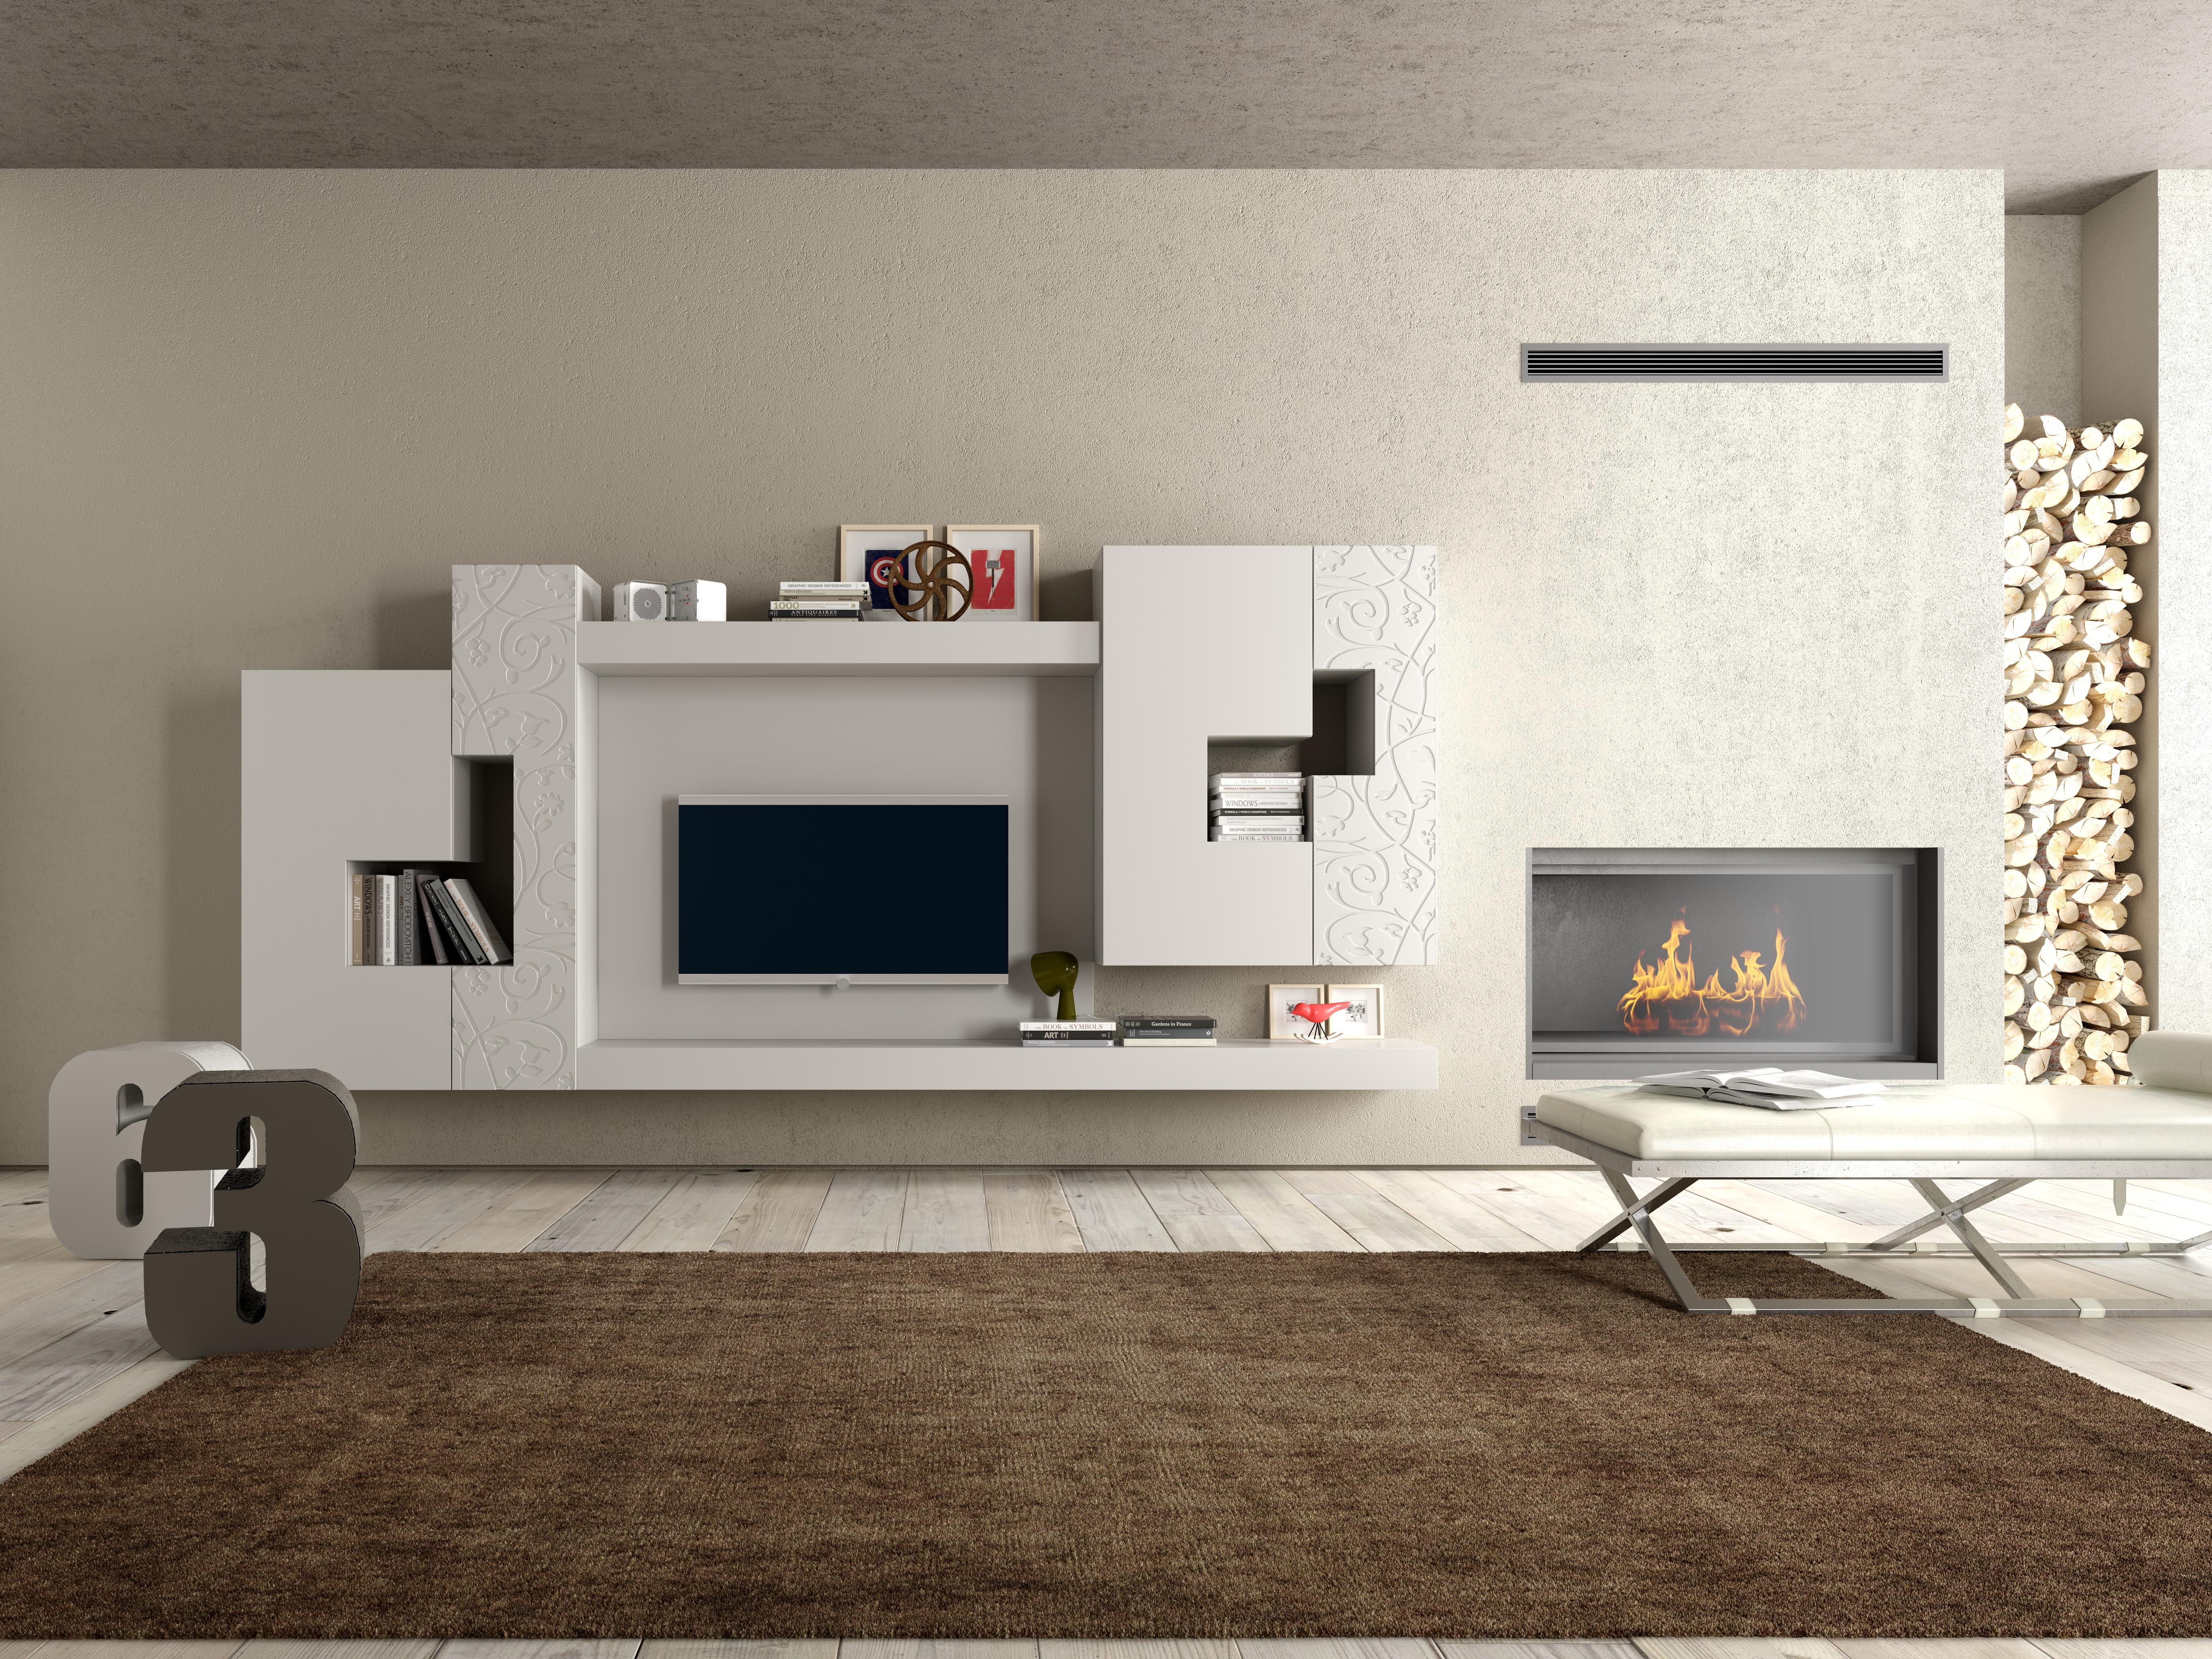 arredamenti moderni decorati | voltan mobili - Mobili Moderni Foto